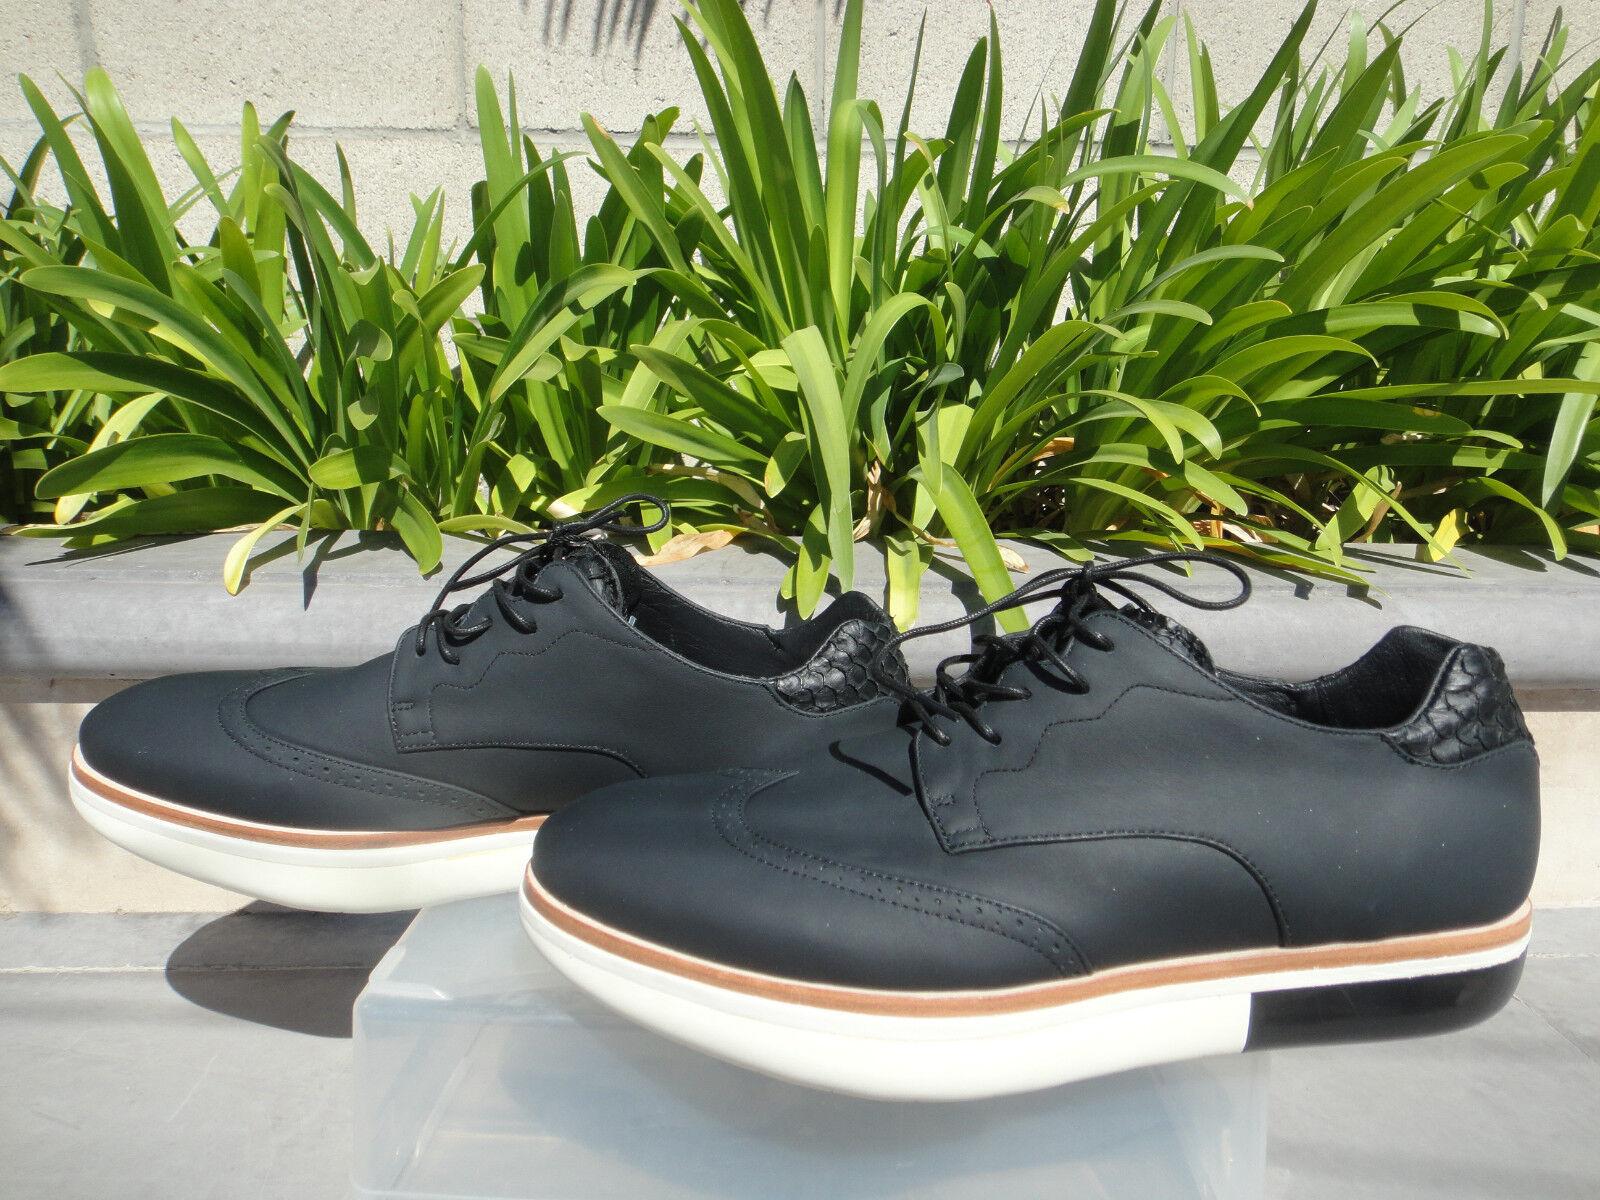 Y-3 x adidas KOREY, Yohji Yamamoto, Sport Style Leather Sole US Sz11 J290 UK10.5